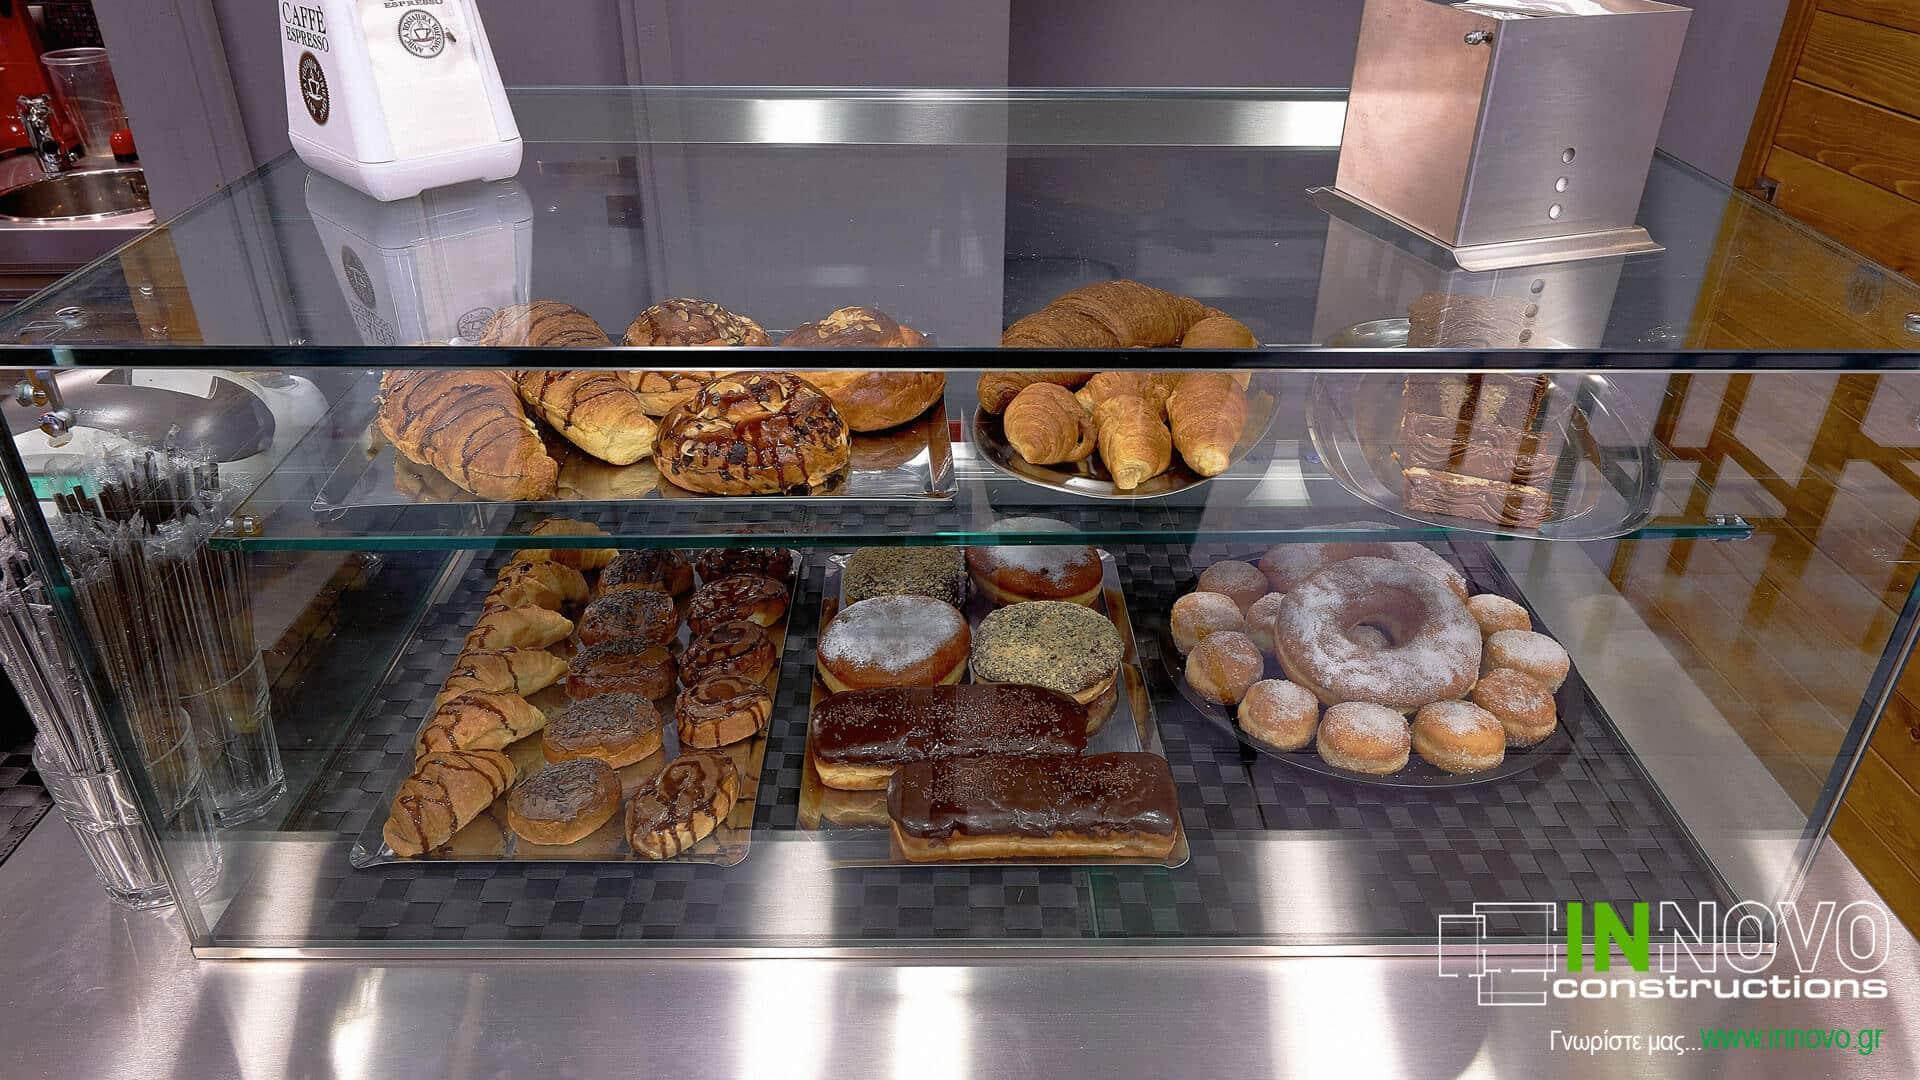 anakainisi-snack-cafe-renovation-snack-cafe-peiraias-1545-12